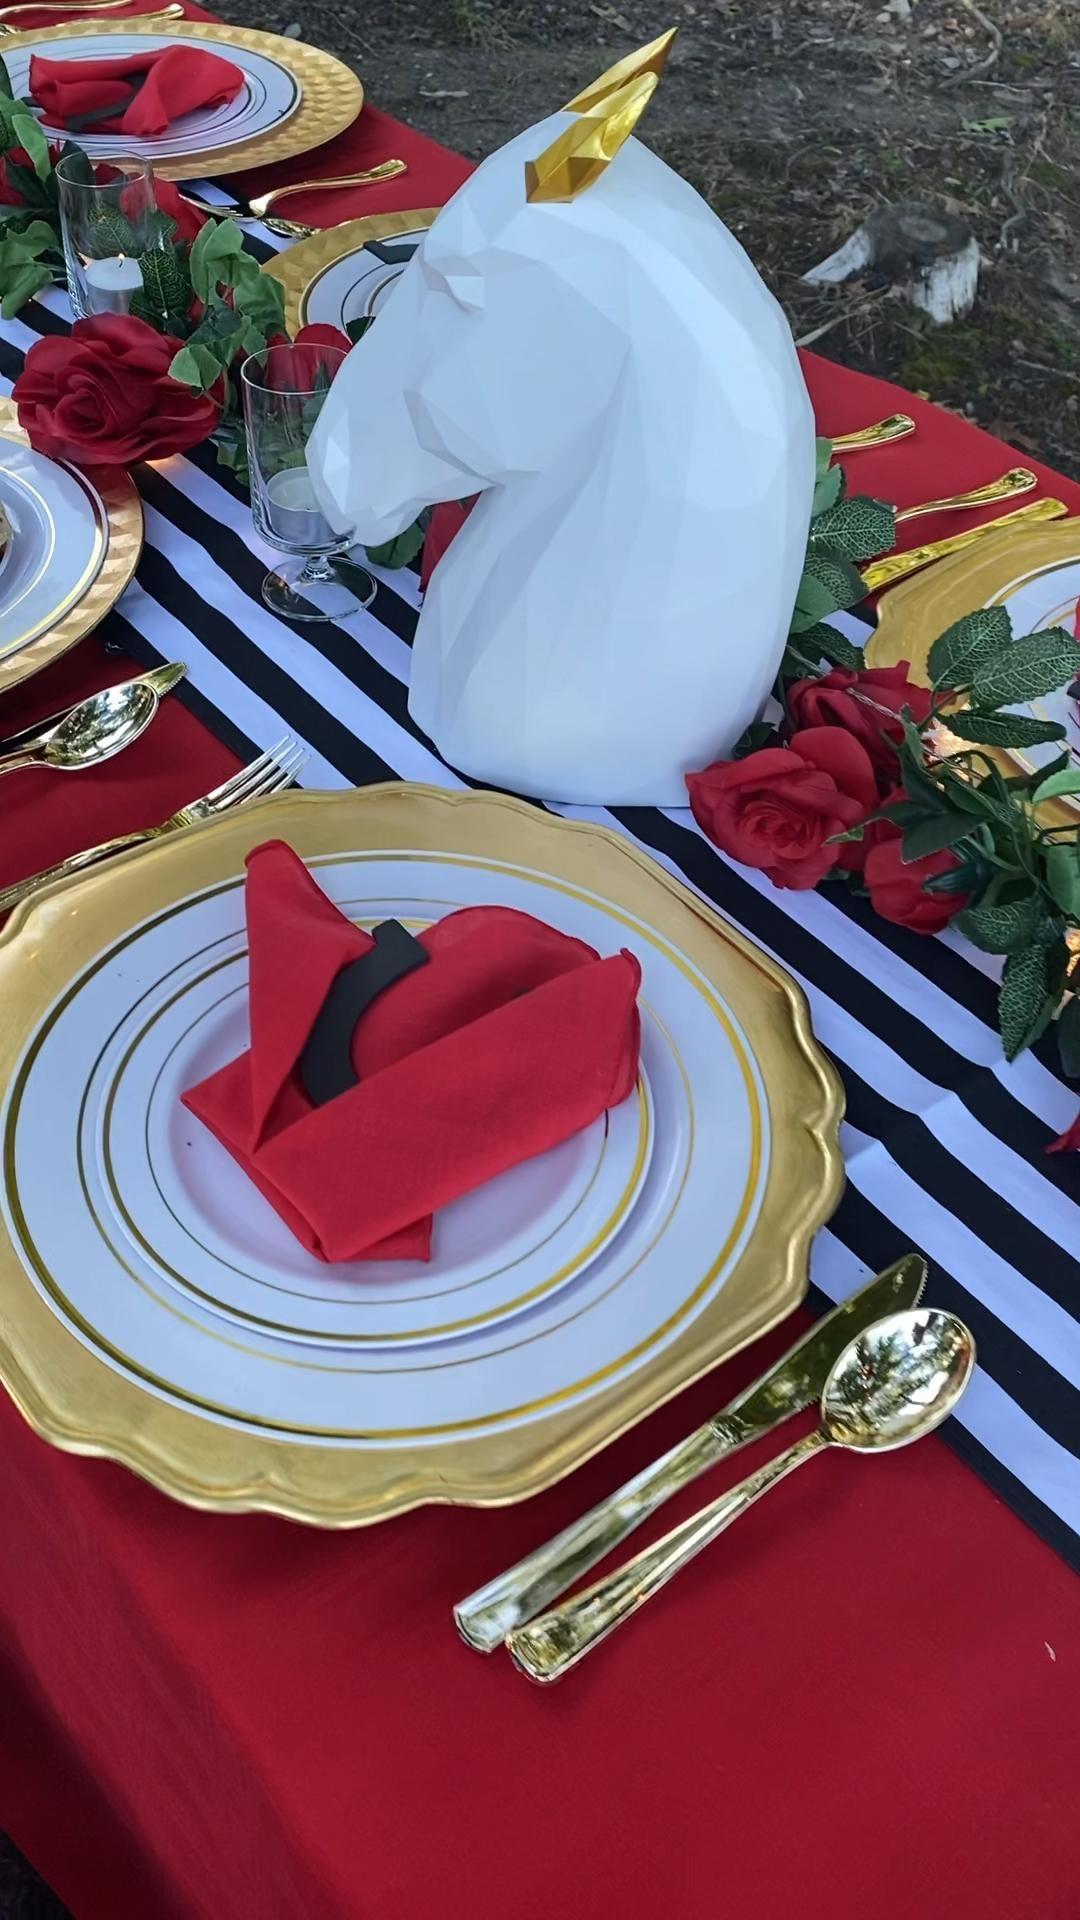 Celebrating an elegant Kentucky Derby table setting! #kyderby #horses #table #tablescape #tabledecor #tabledecorations